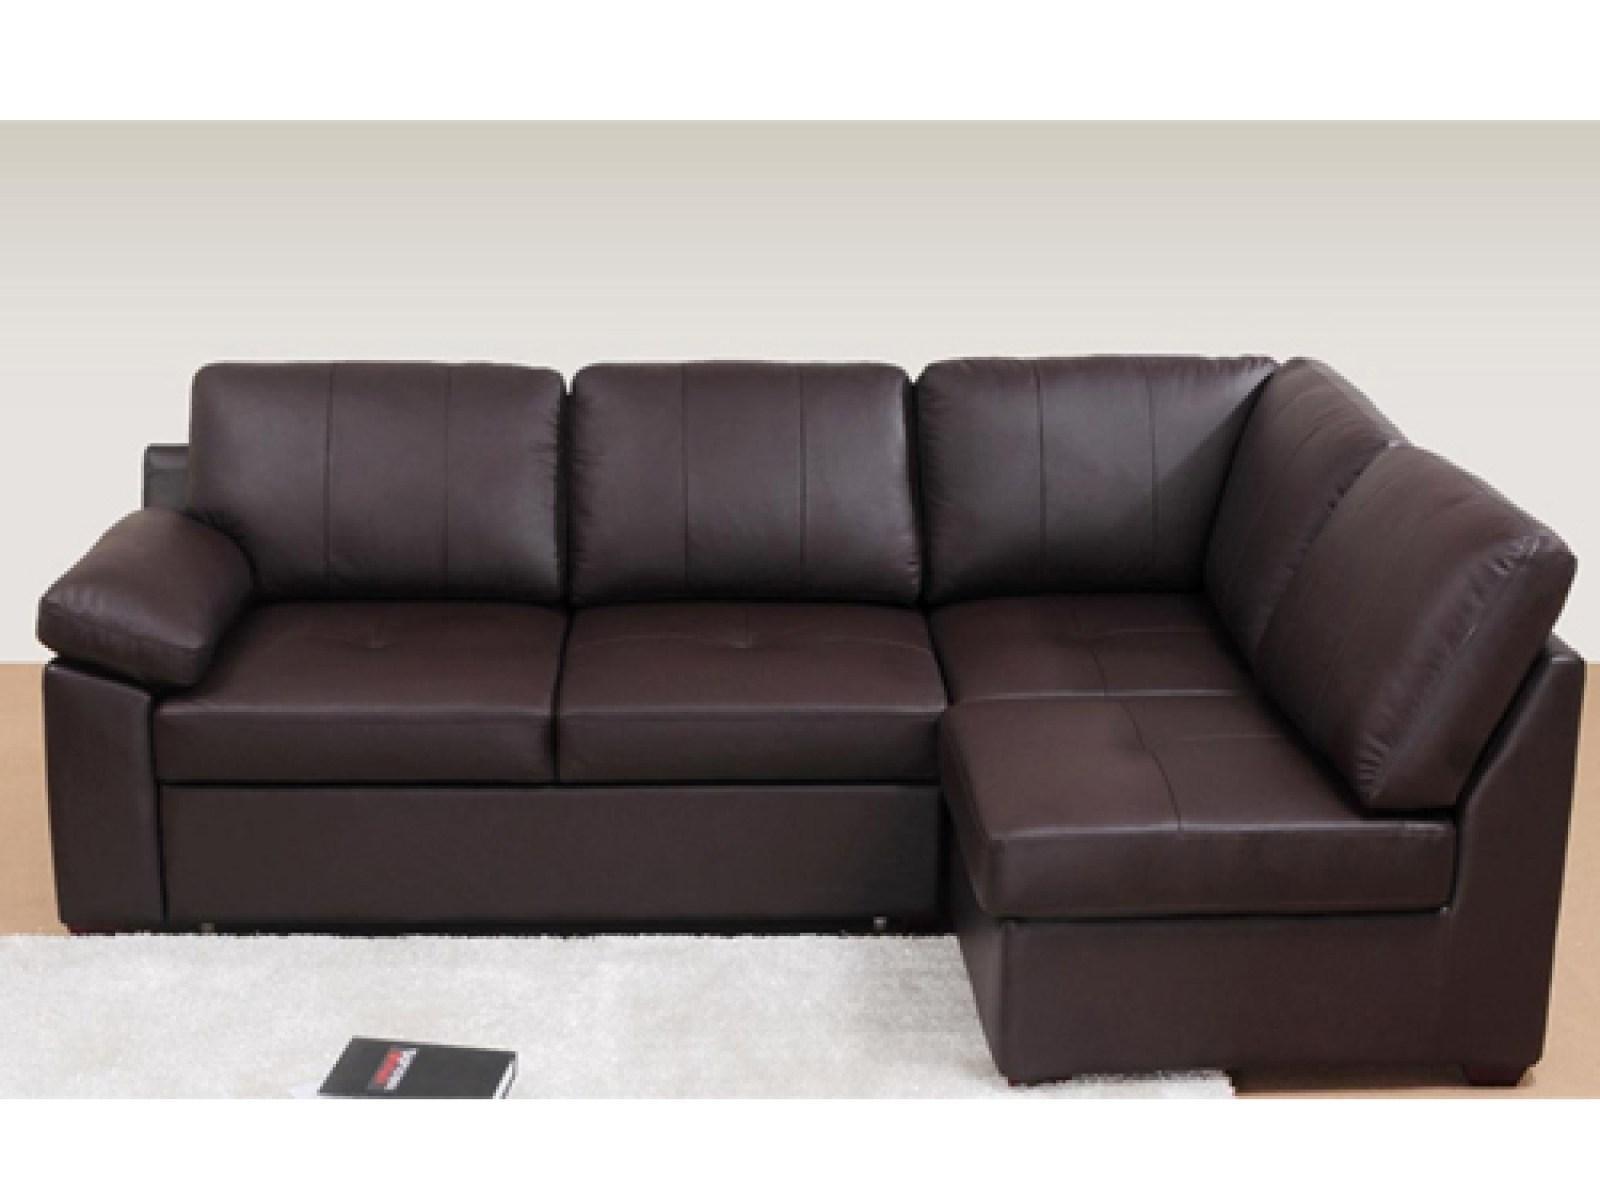 sofa bed corner sale how to make a camper 20 best ideas